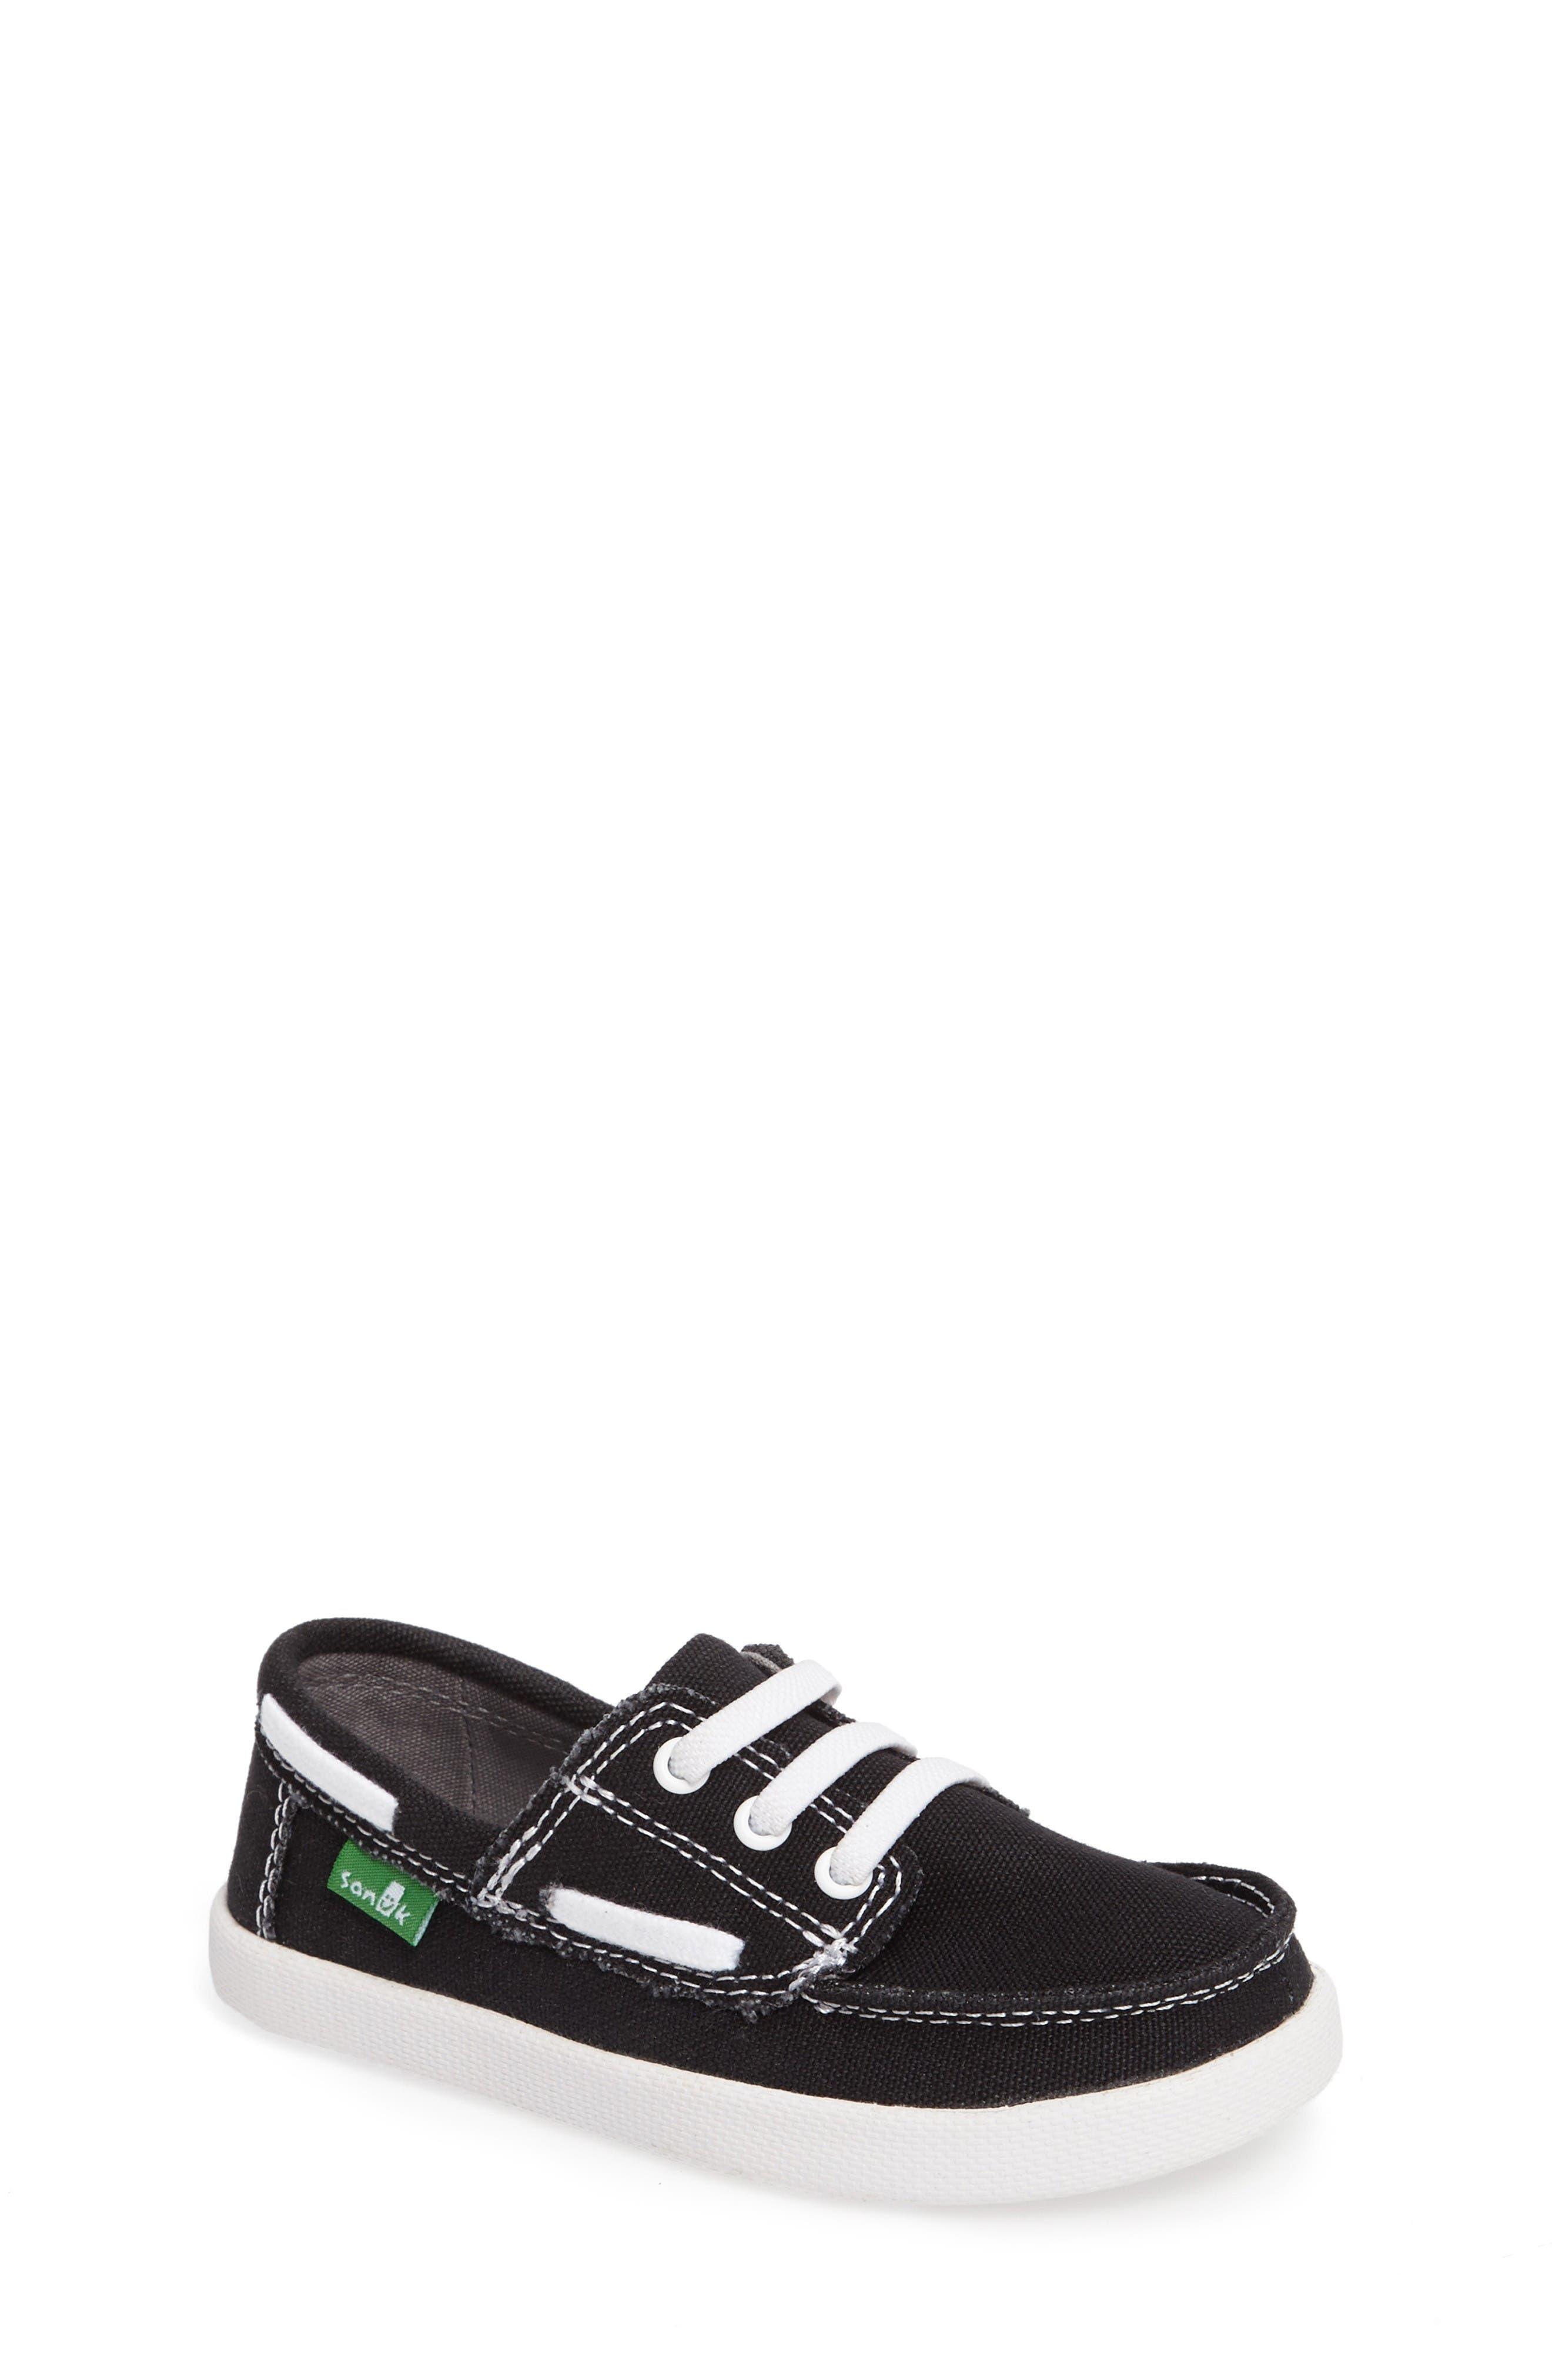 Lil Deck Hand Slip-On Sneaker,                             Main thumbnail 1, color,                             Black